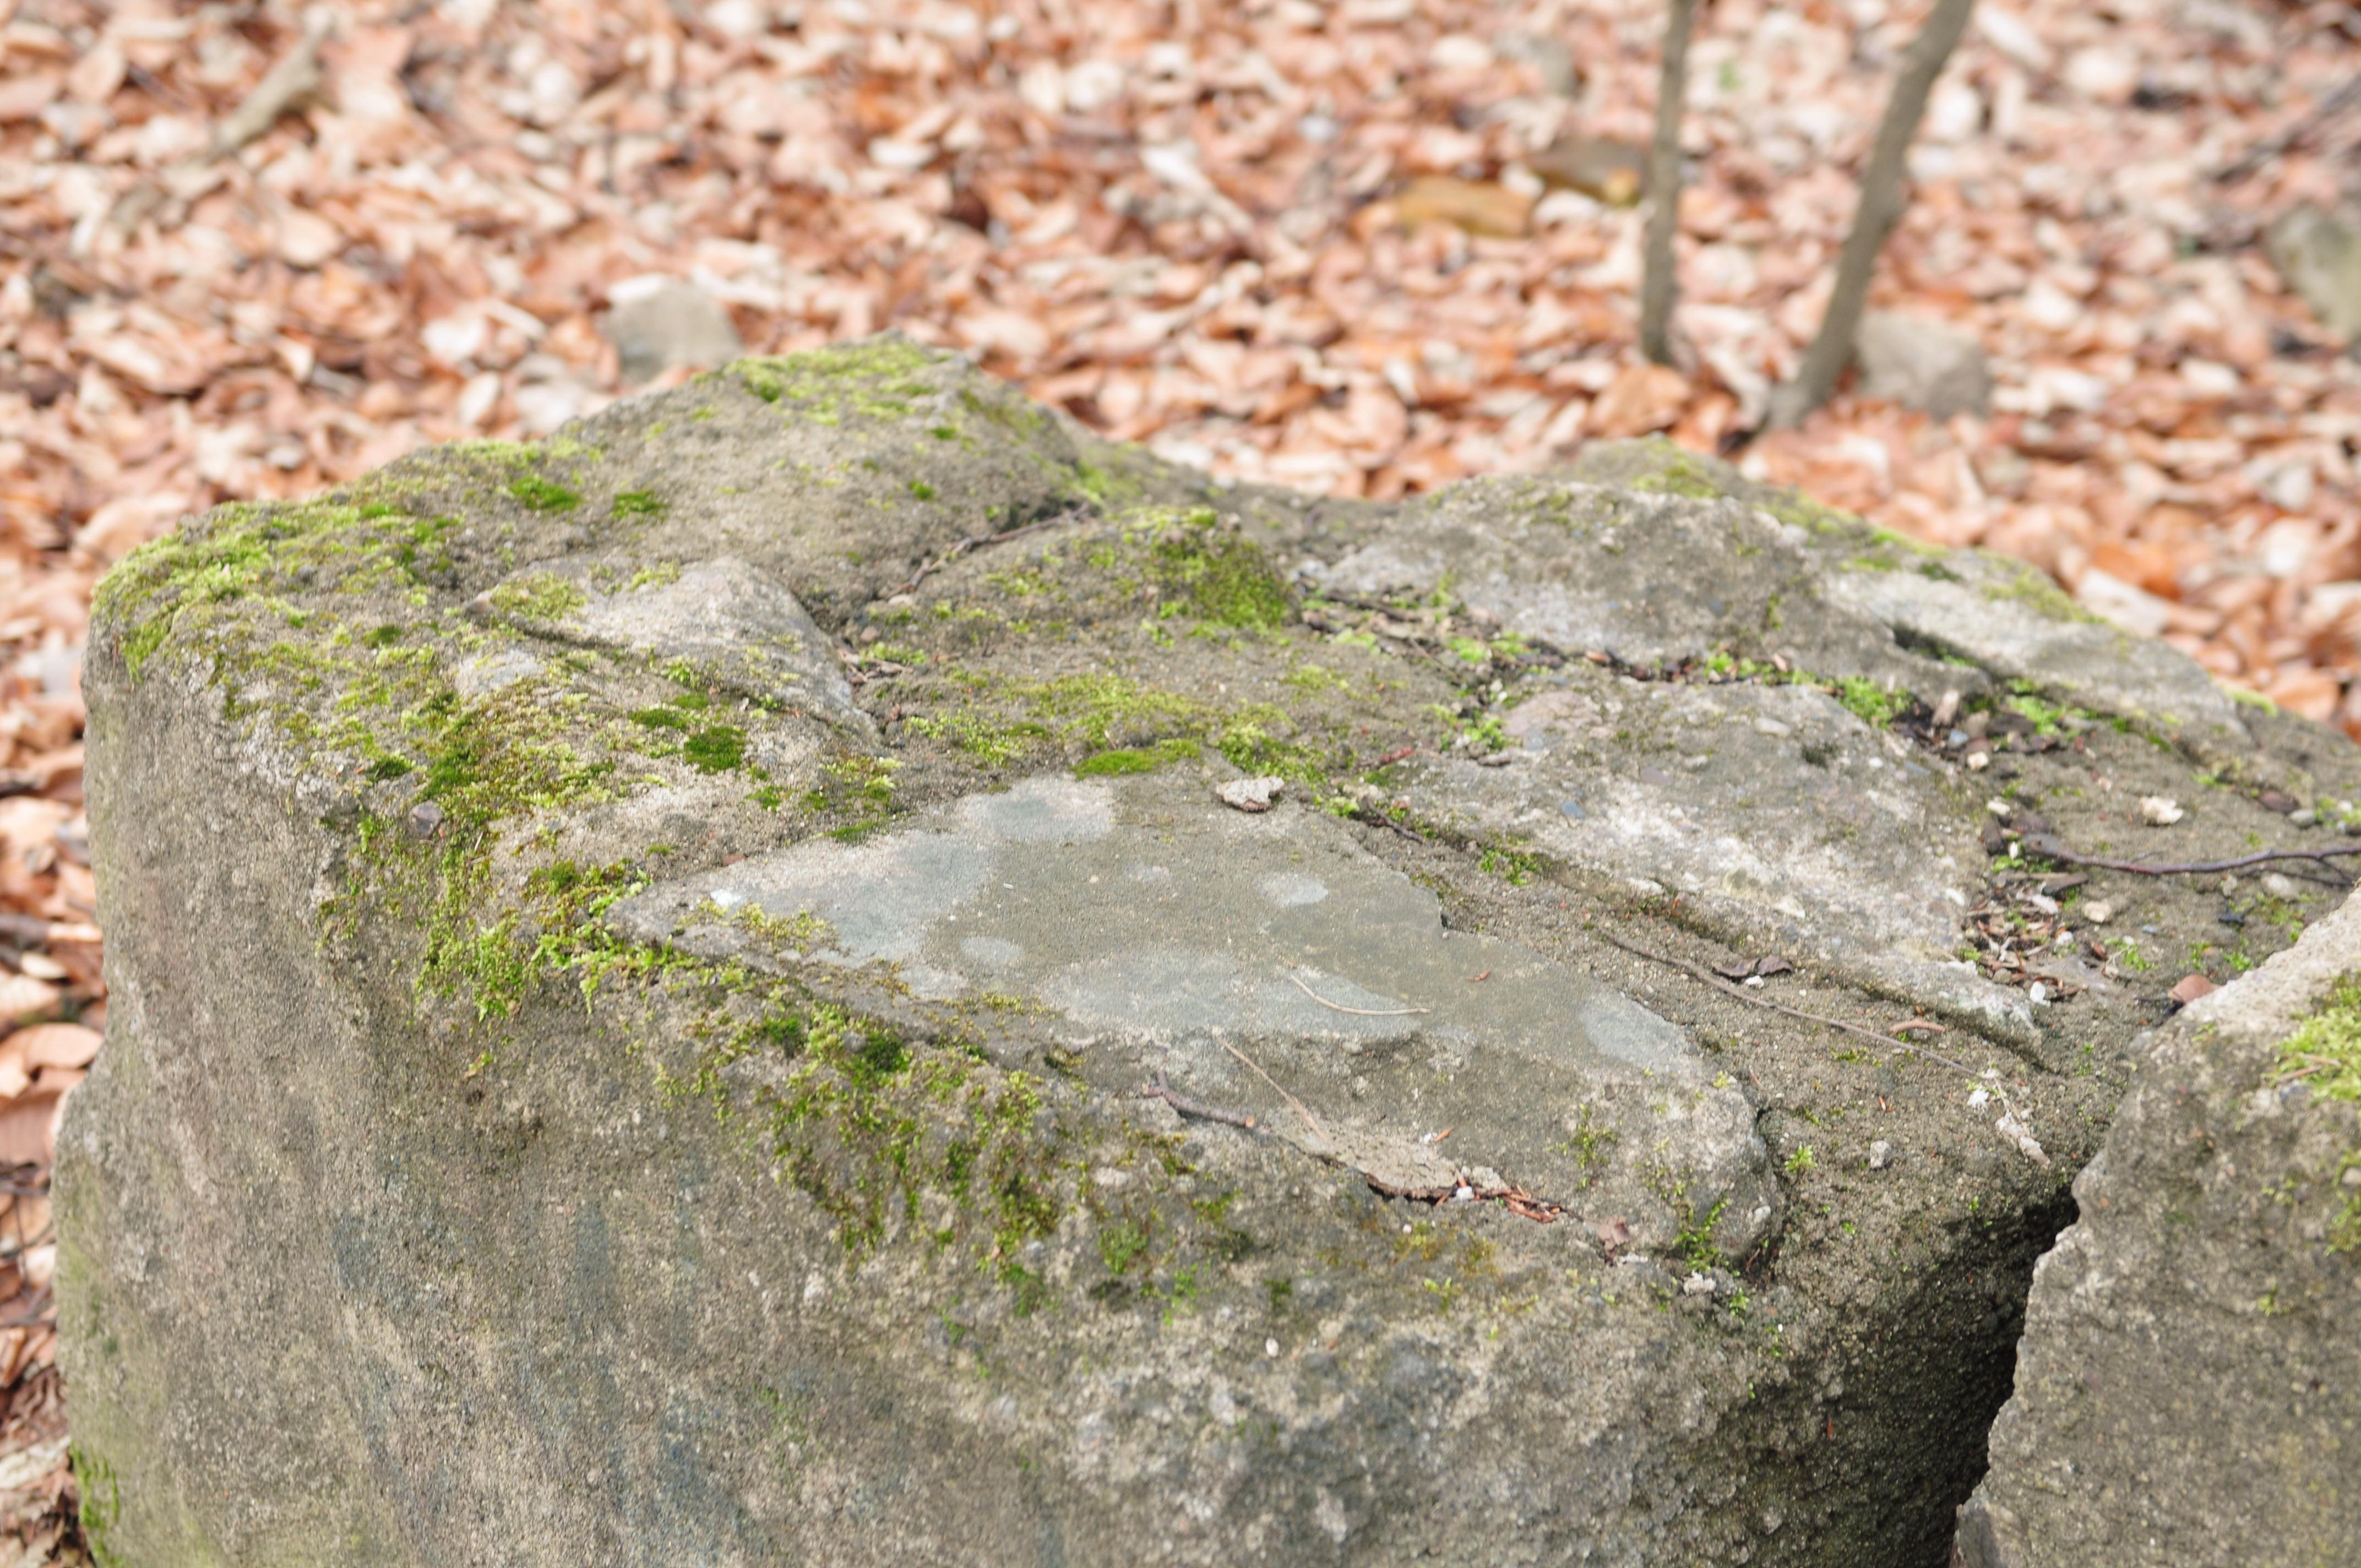 14-04-07-franzosenbunker-eberswalde-22.jpg